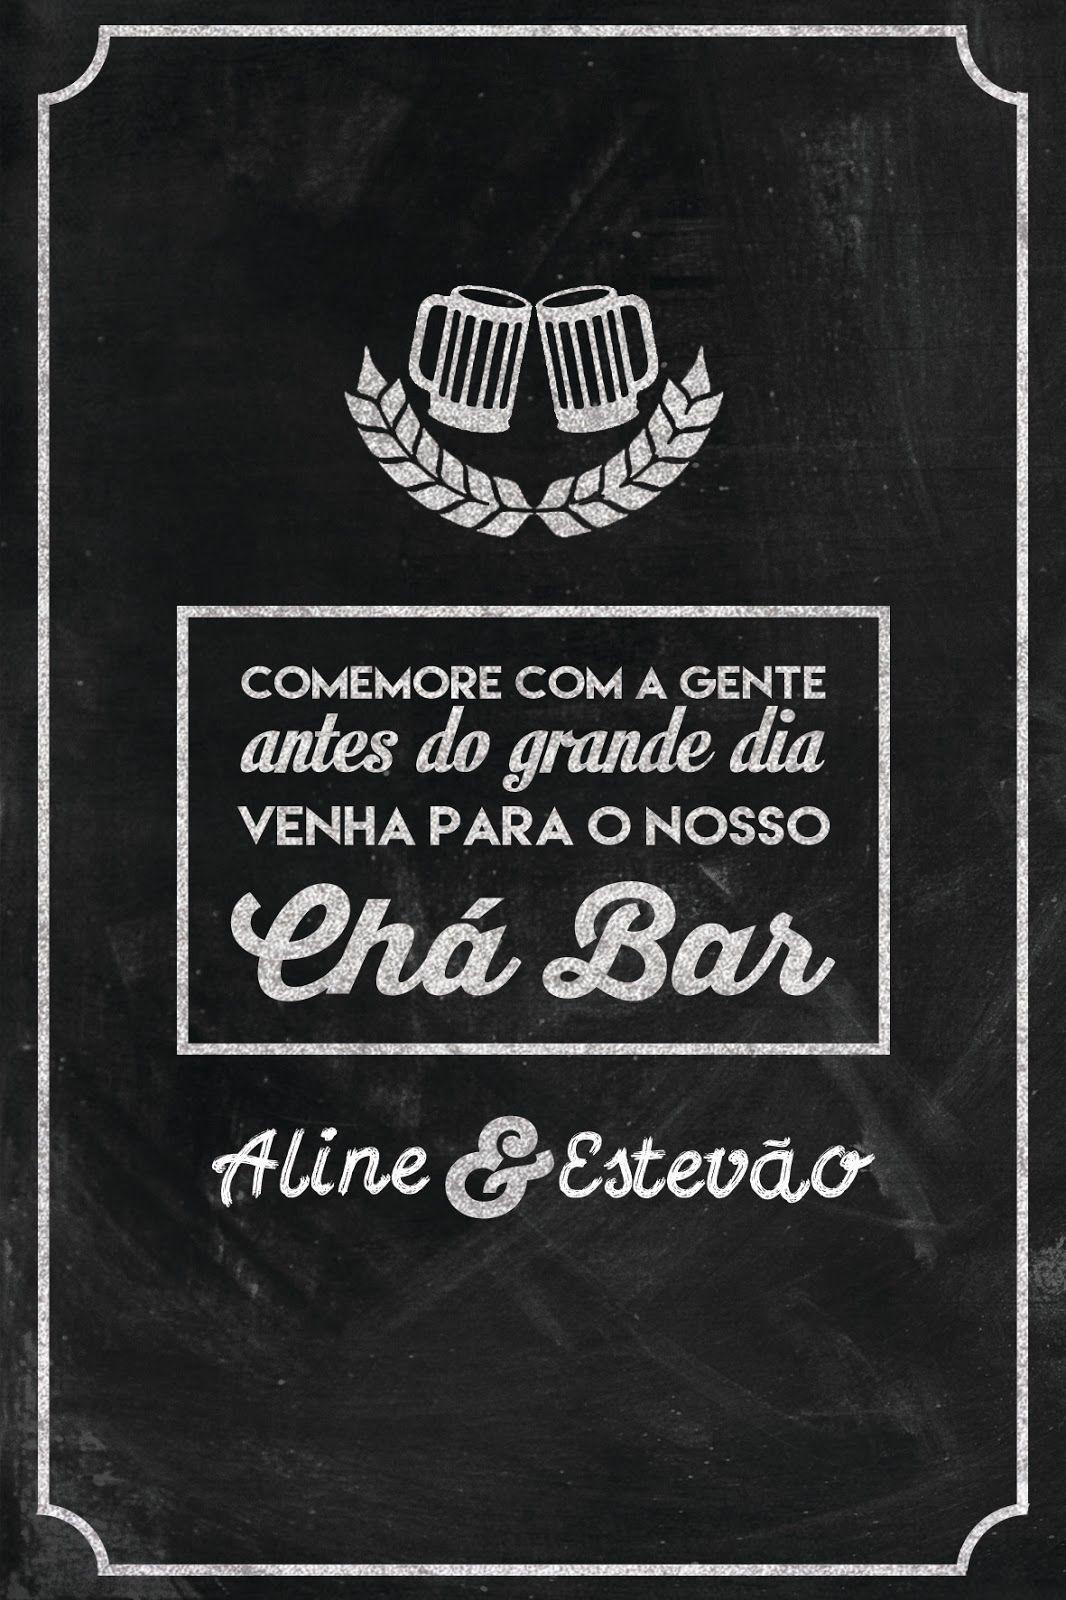 Convite Para Chá Bar Cha Bar Bar Wedding Invitations